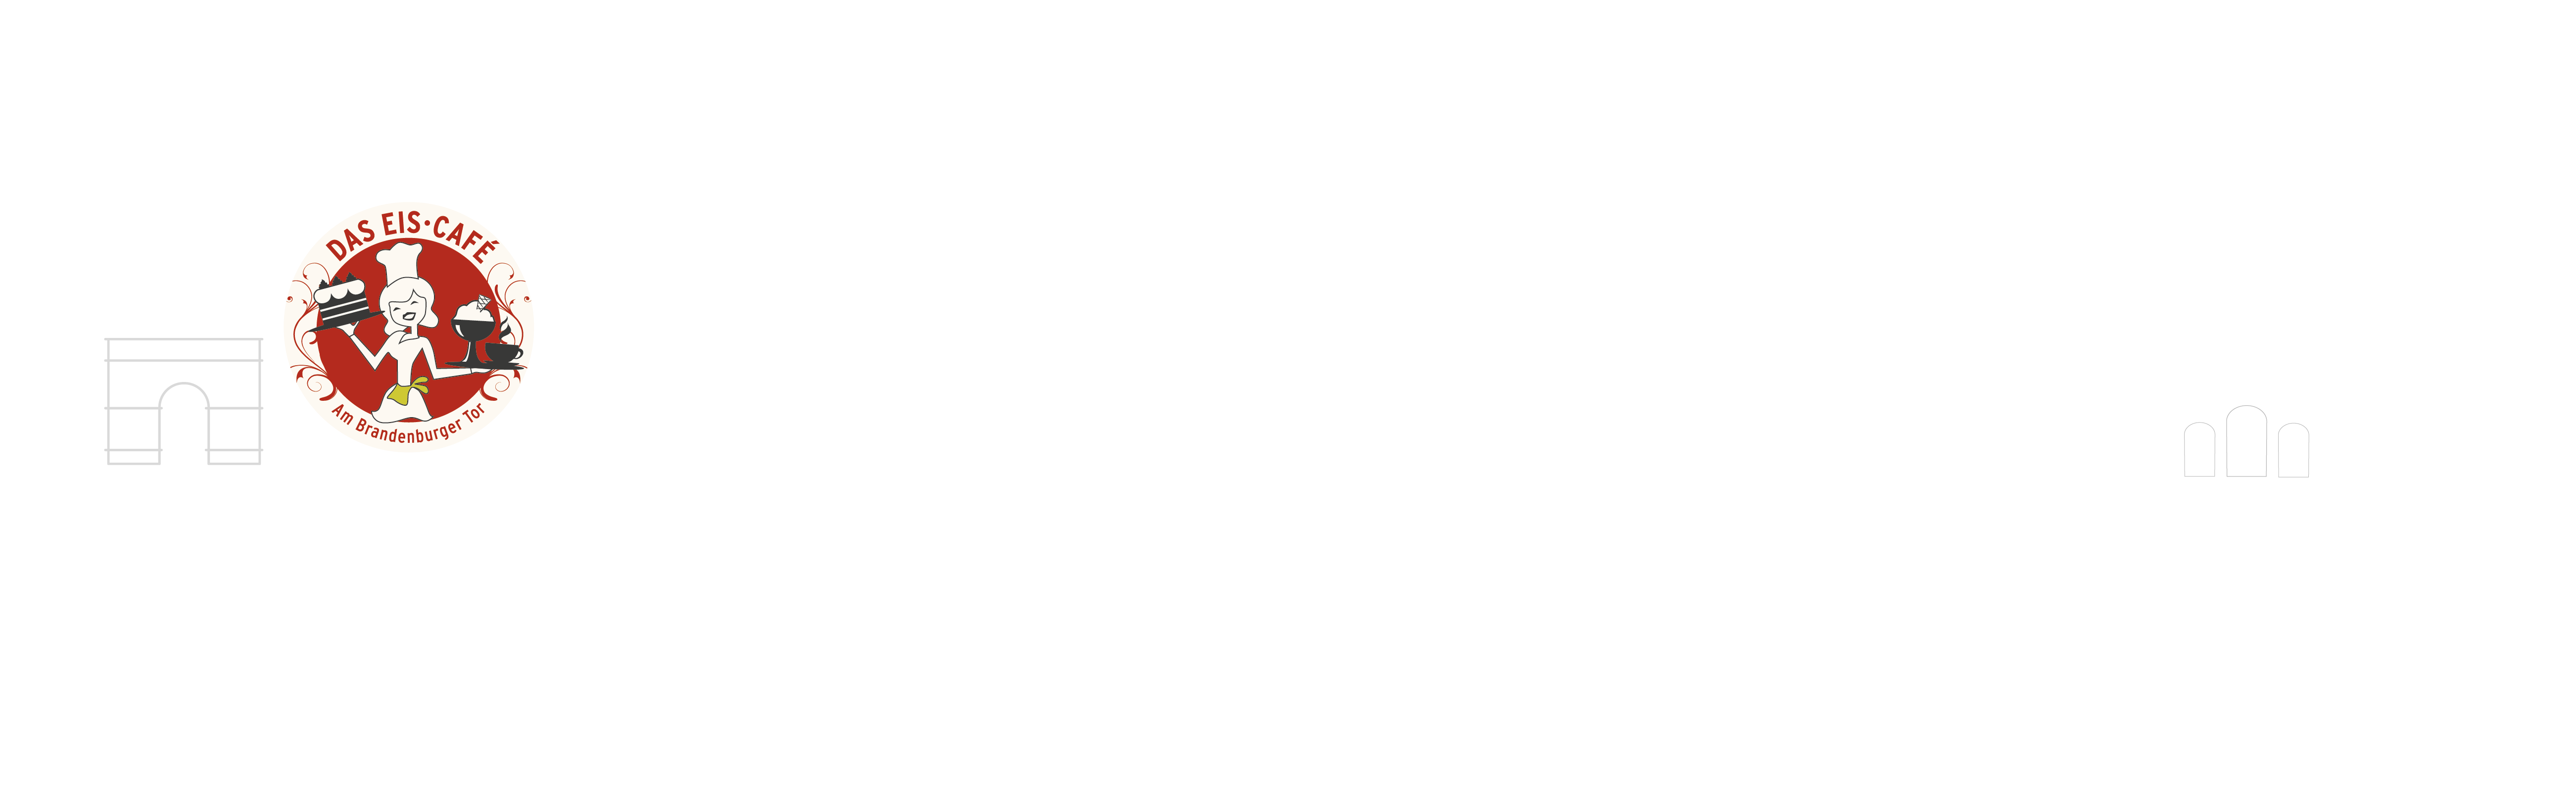 Eis-Café-Potsdam-Stadtplan